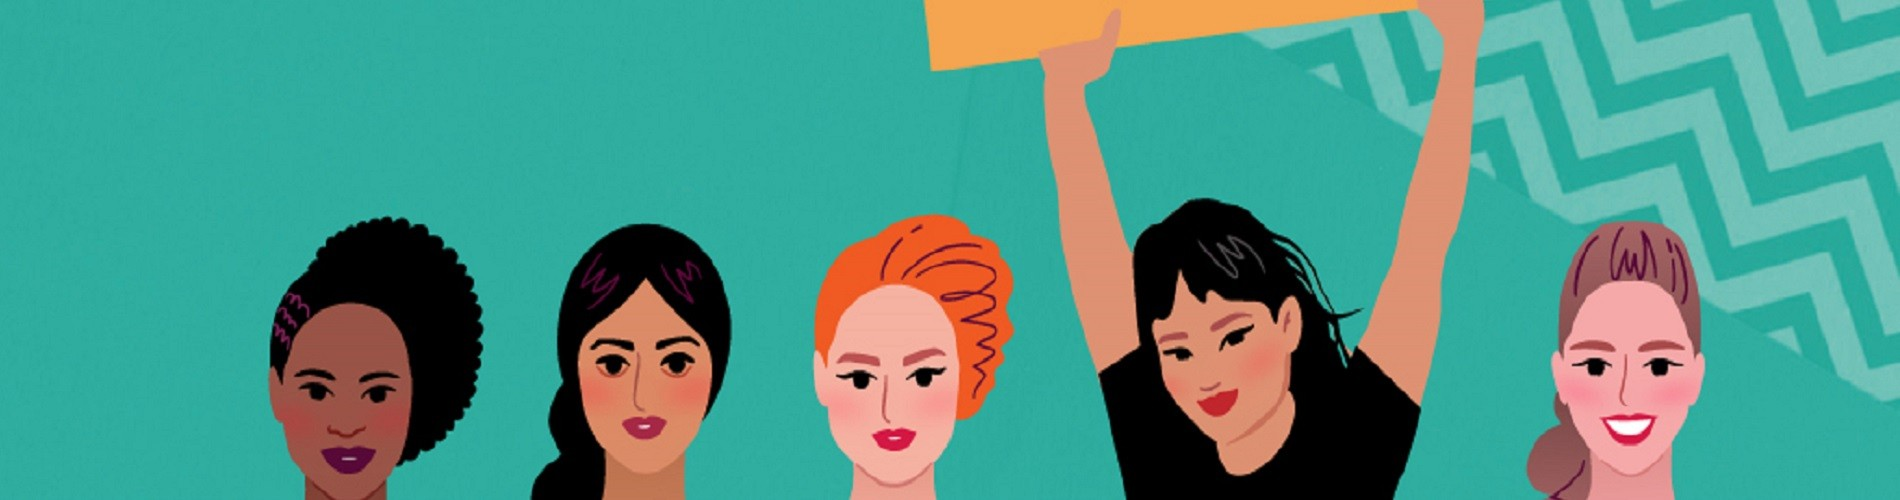 Girls in Politics